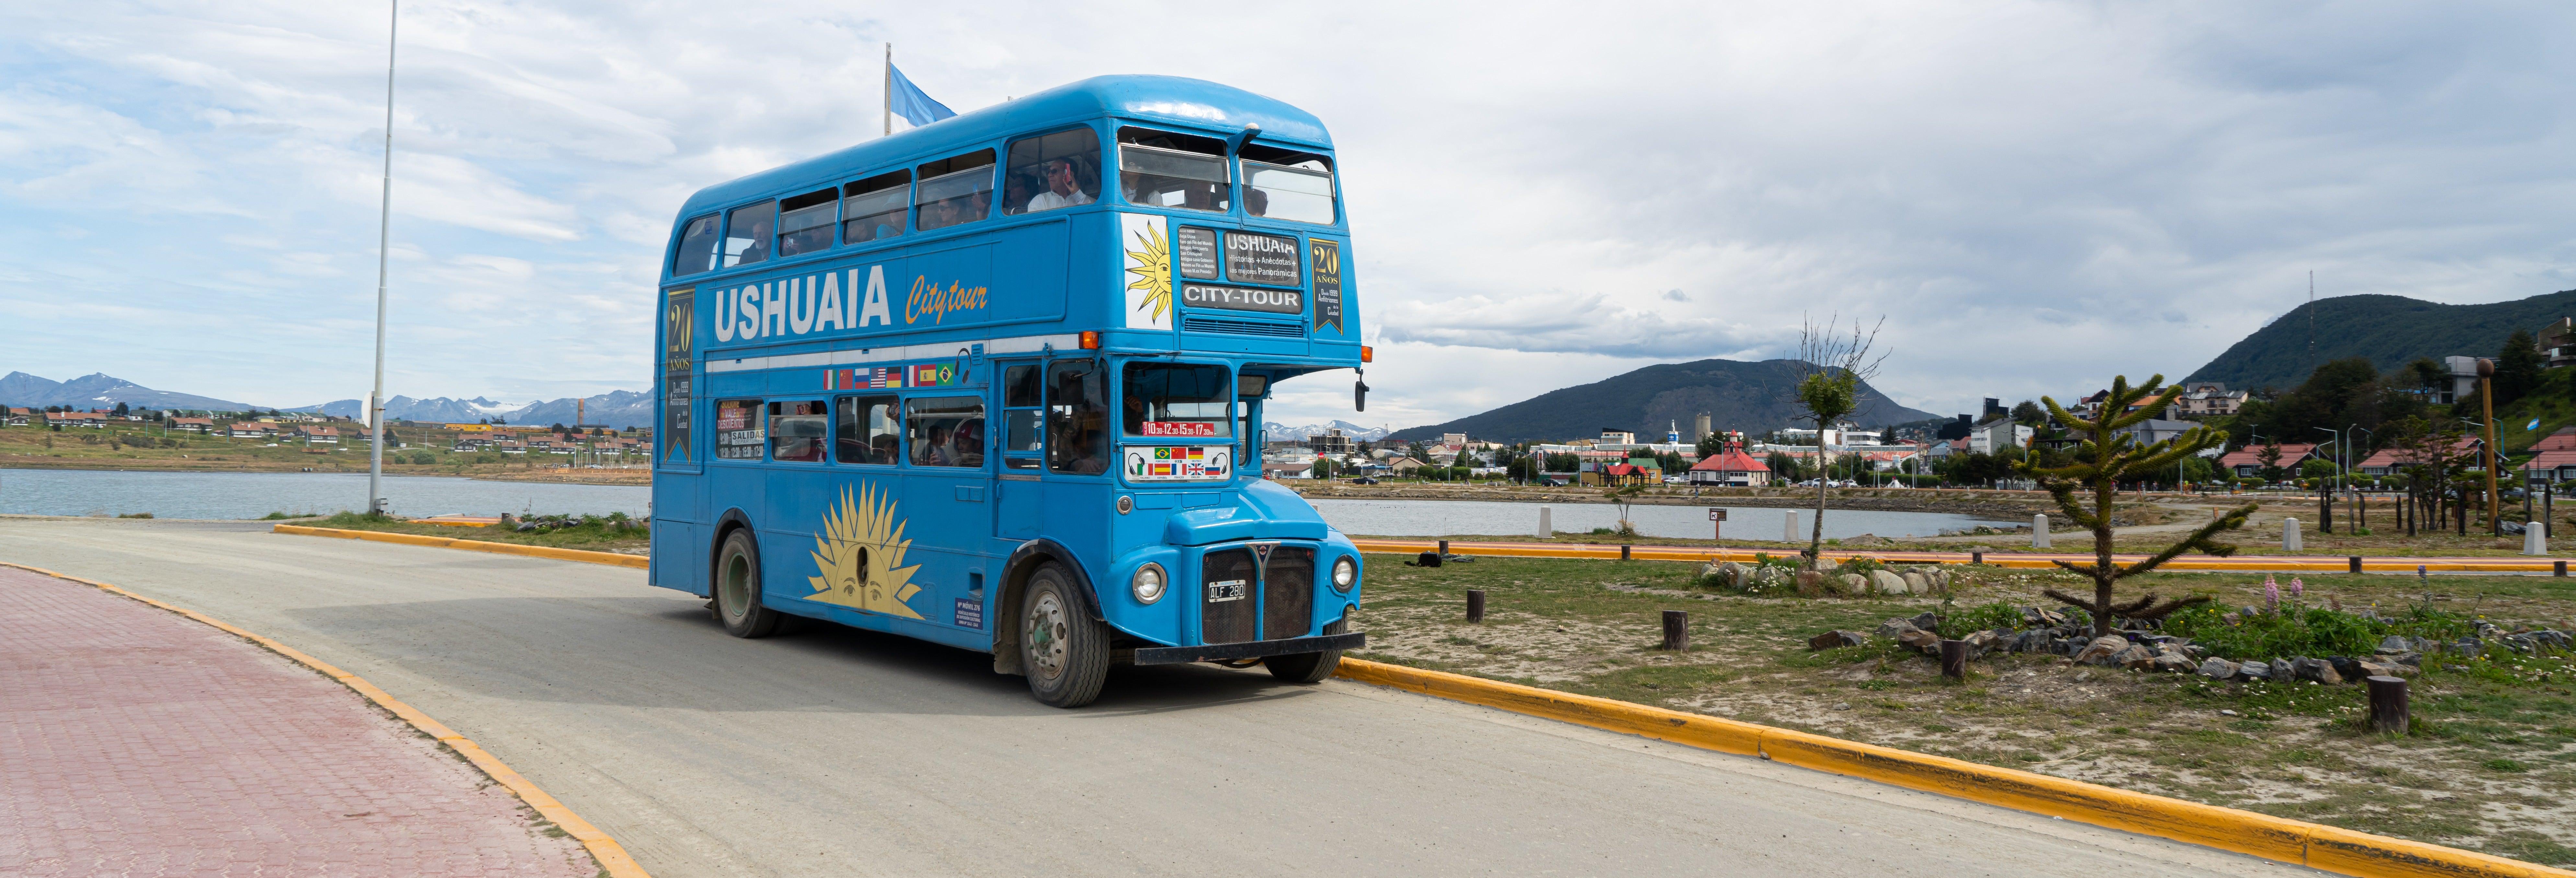 Visite panoramique dans Ushuaïa